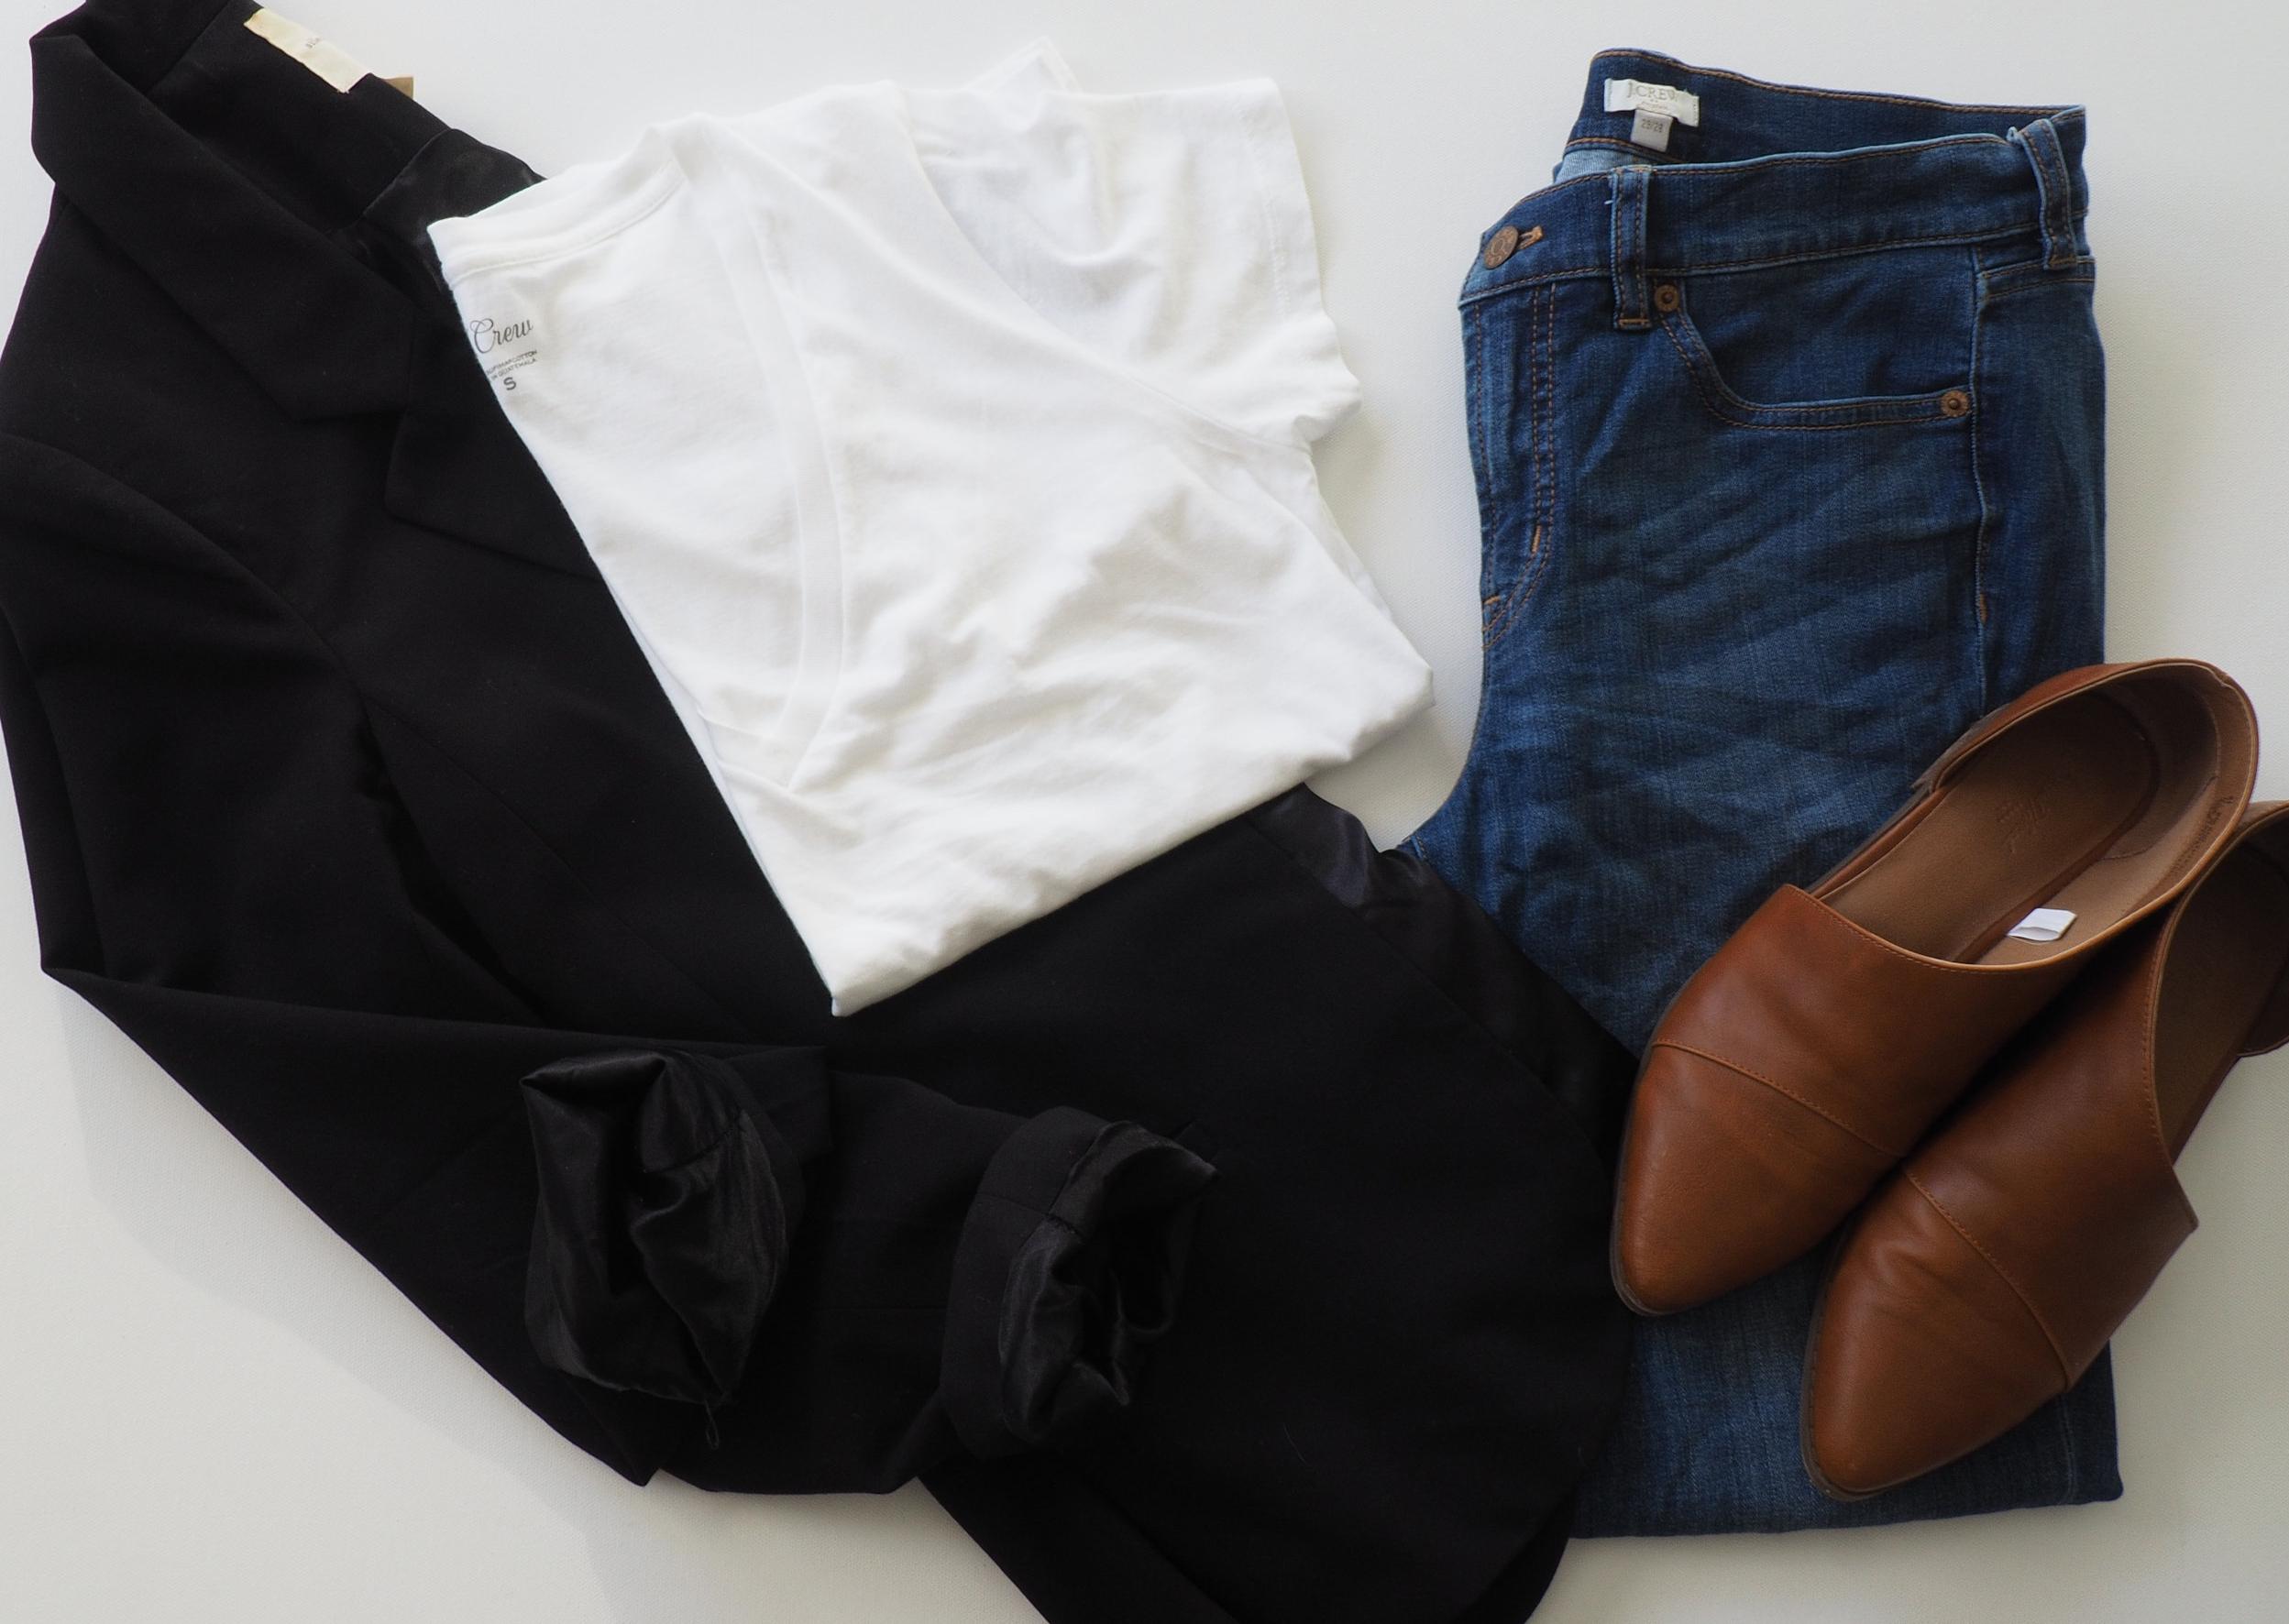 Blazer  (Similar) |  T Shirt  |  Jeans  |  Booties